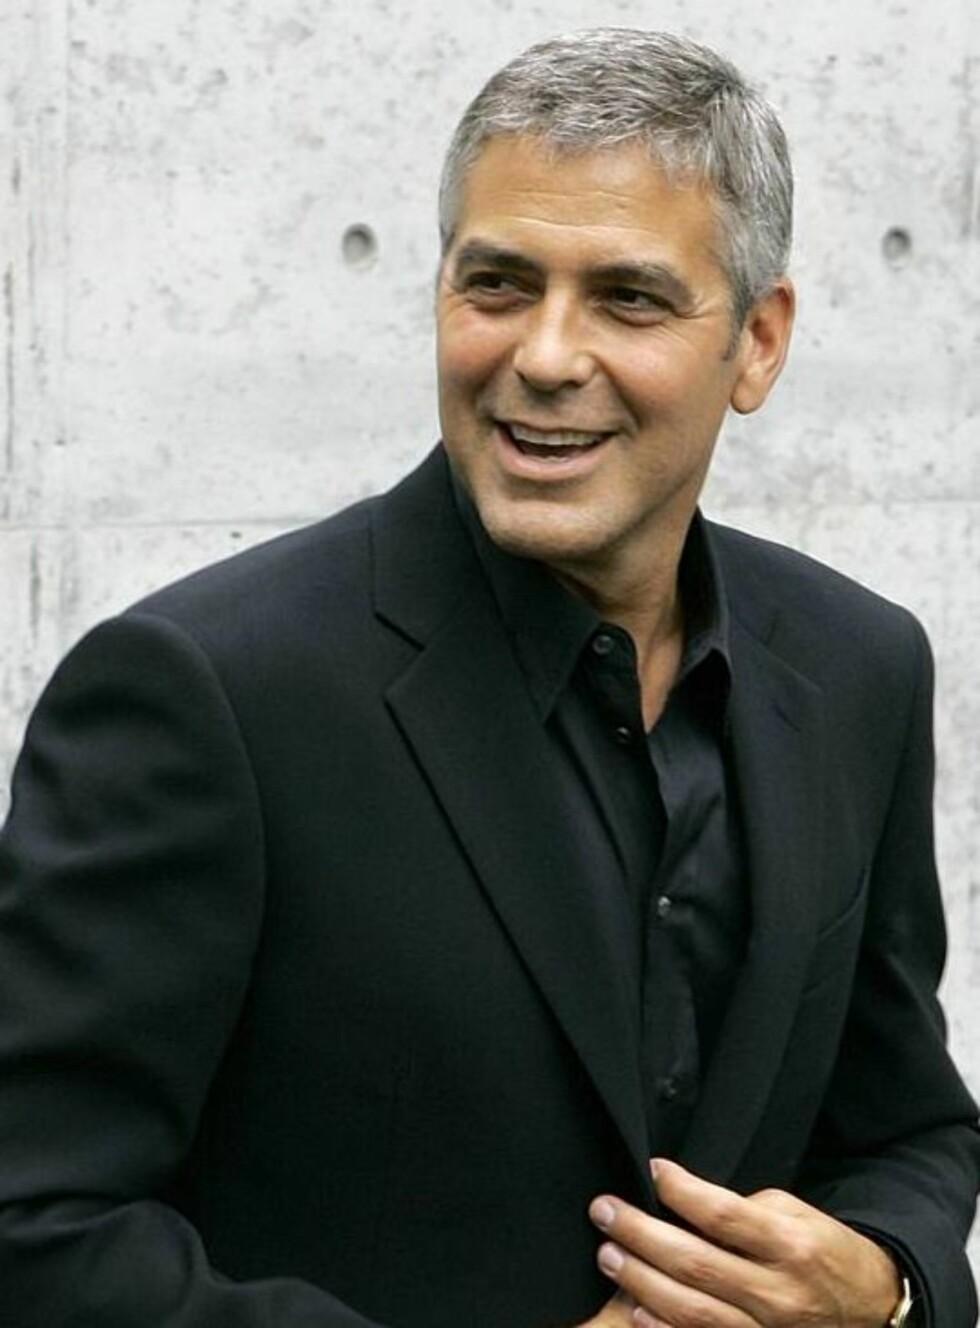 FIIIN GAMMEL ÅRGANG: George Clooney blir bare mer sexy med årene.... Foto: AP/Scanpix